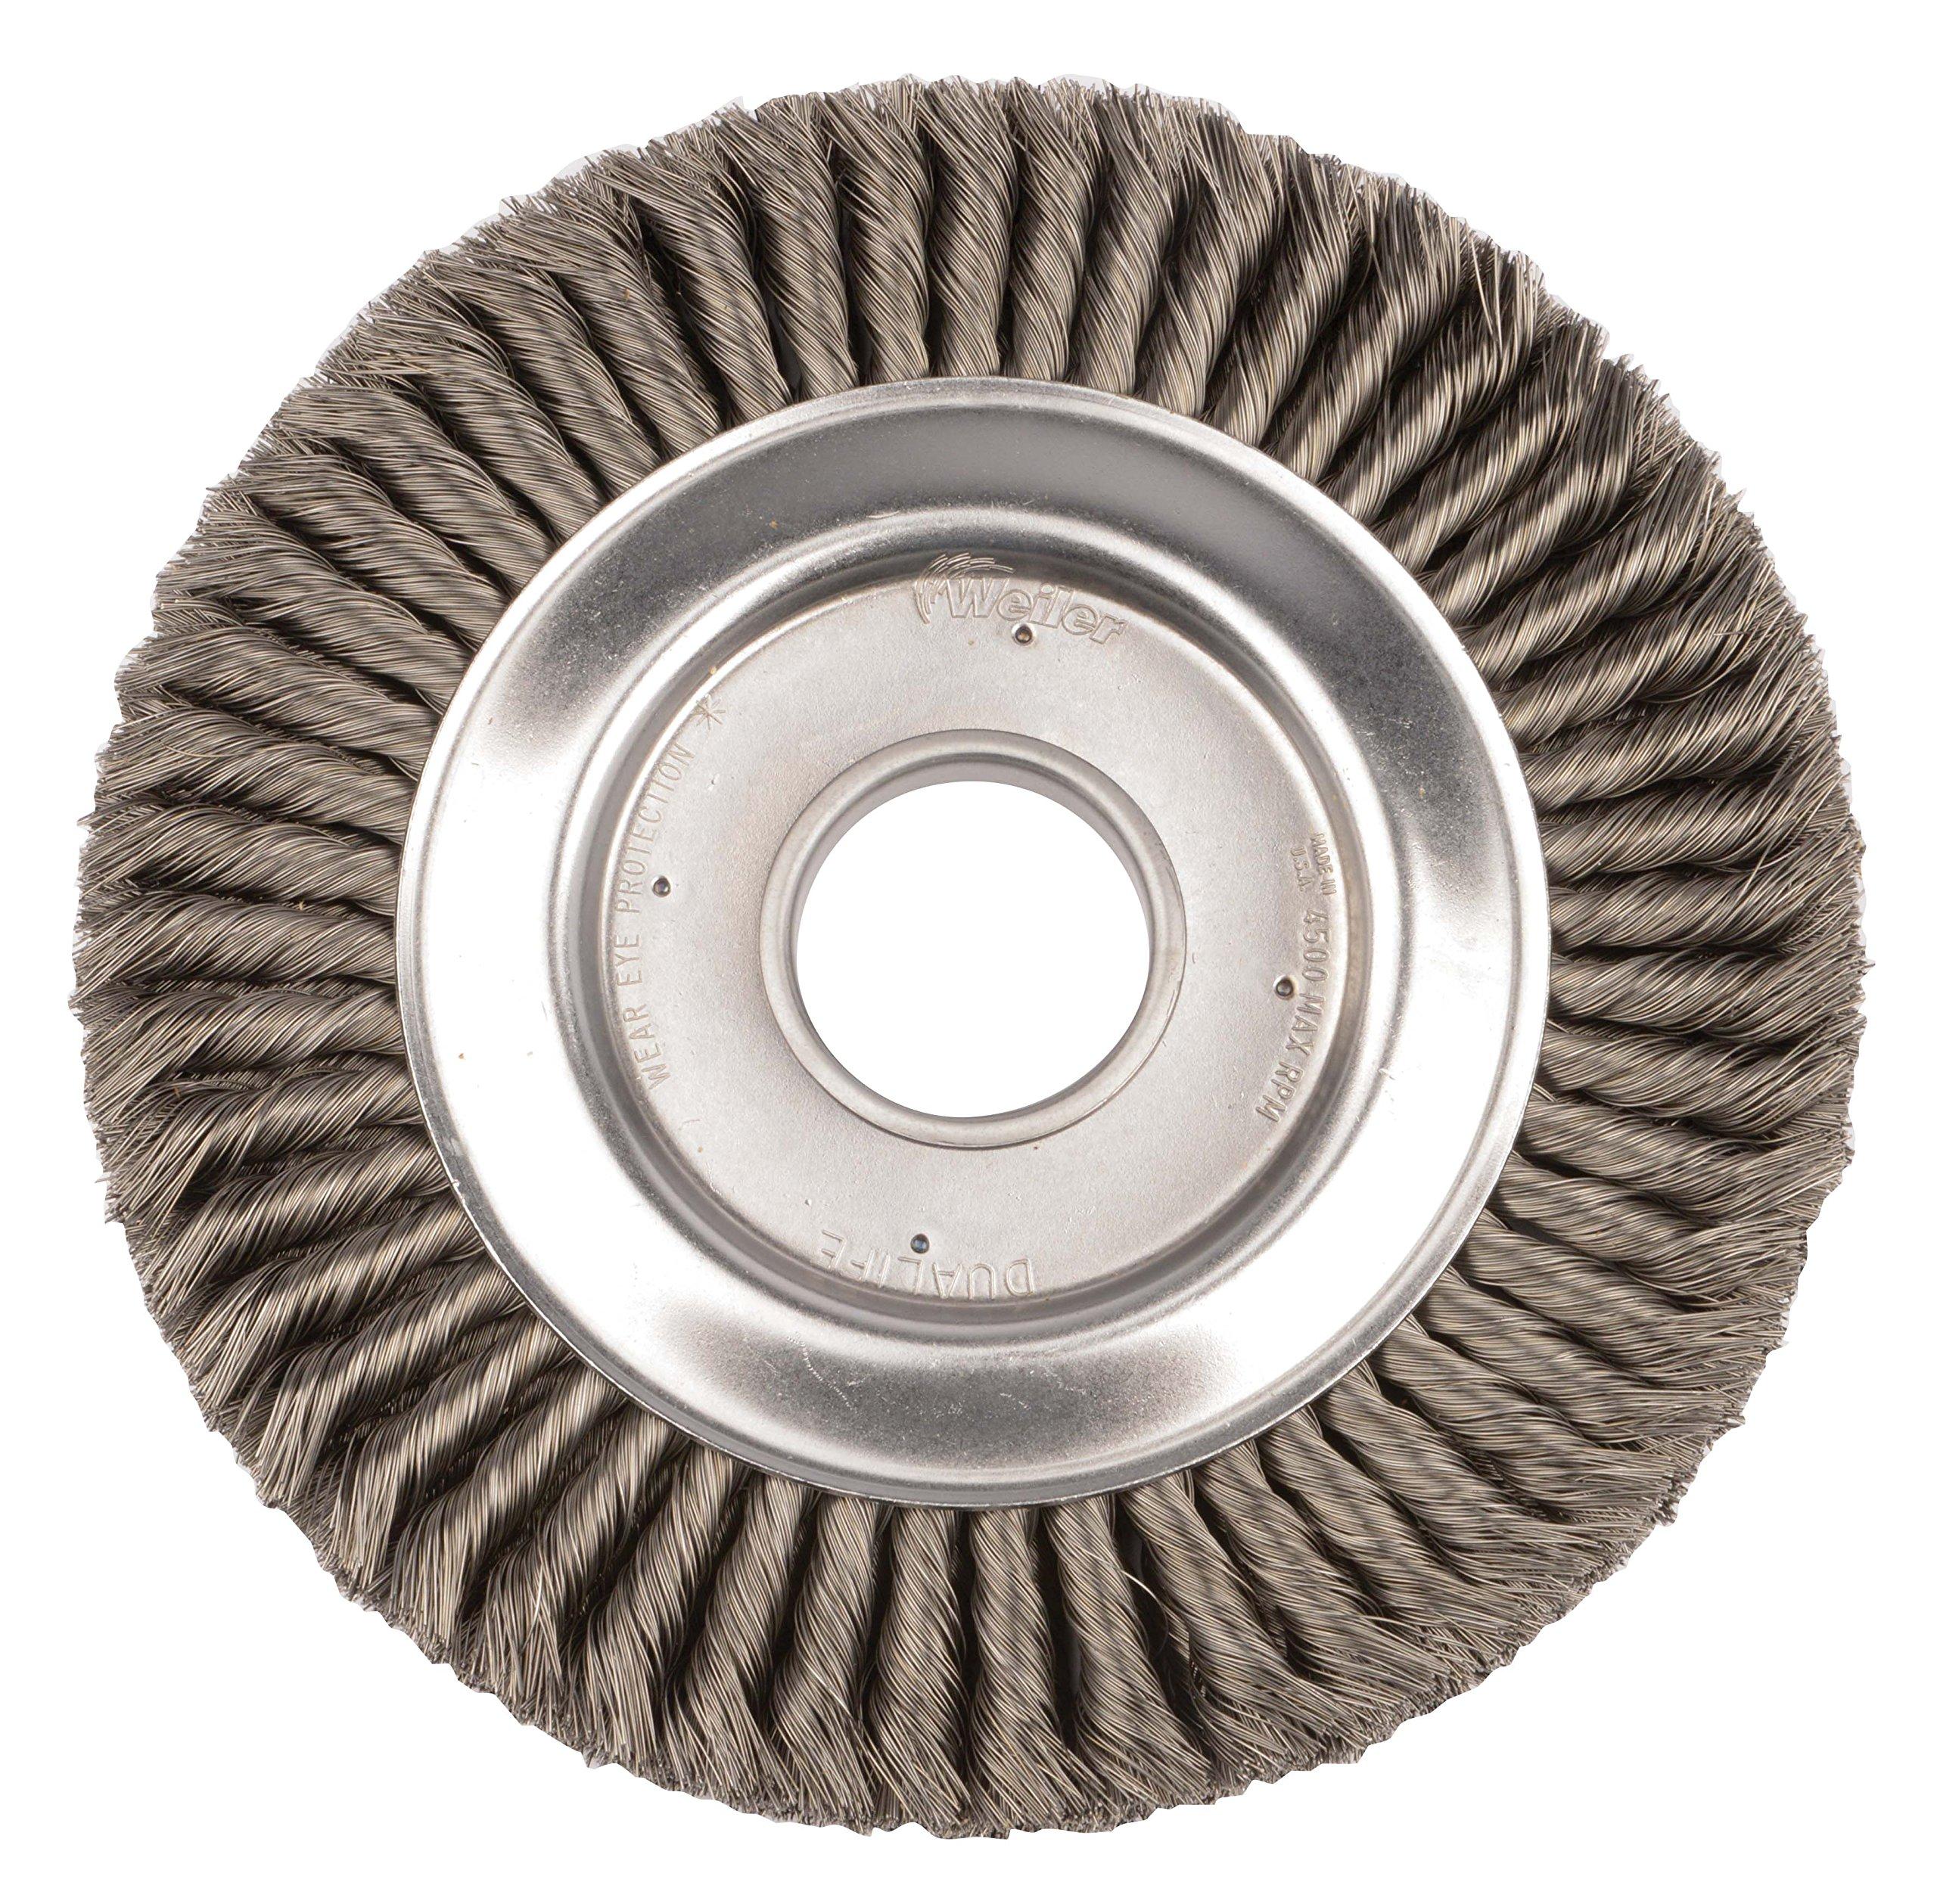 Weiler 9480 Standard Twist Knot Wire Wheel, 10'', 0.16'' Steel Fill, 2'' Arbor Hole by Weiler (Image #1)